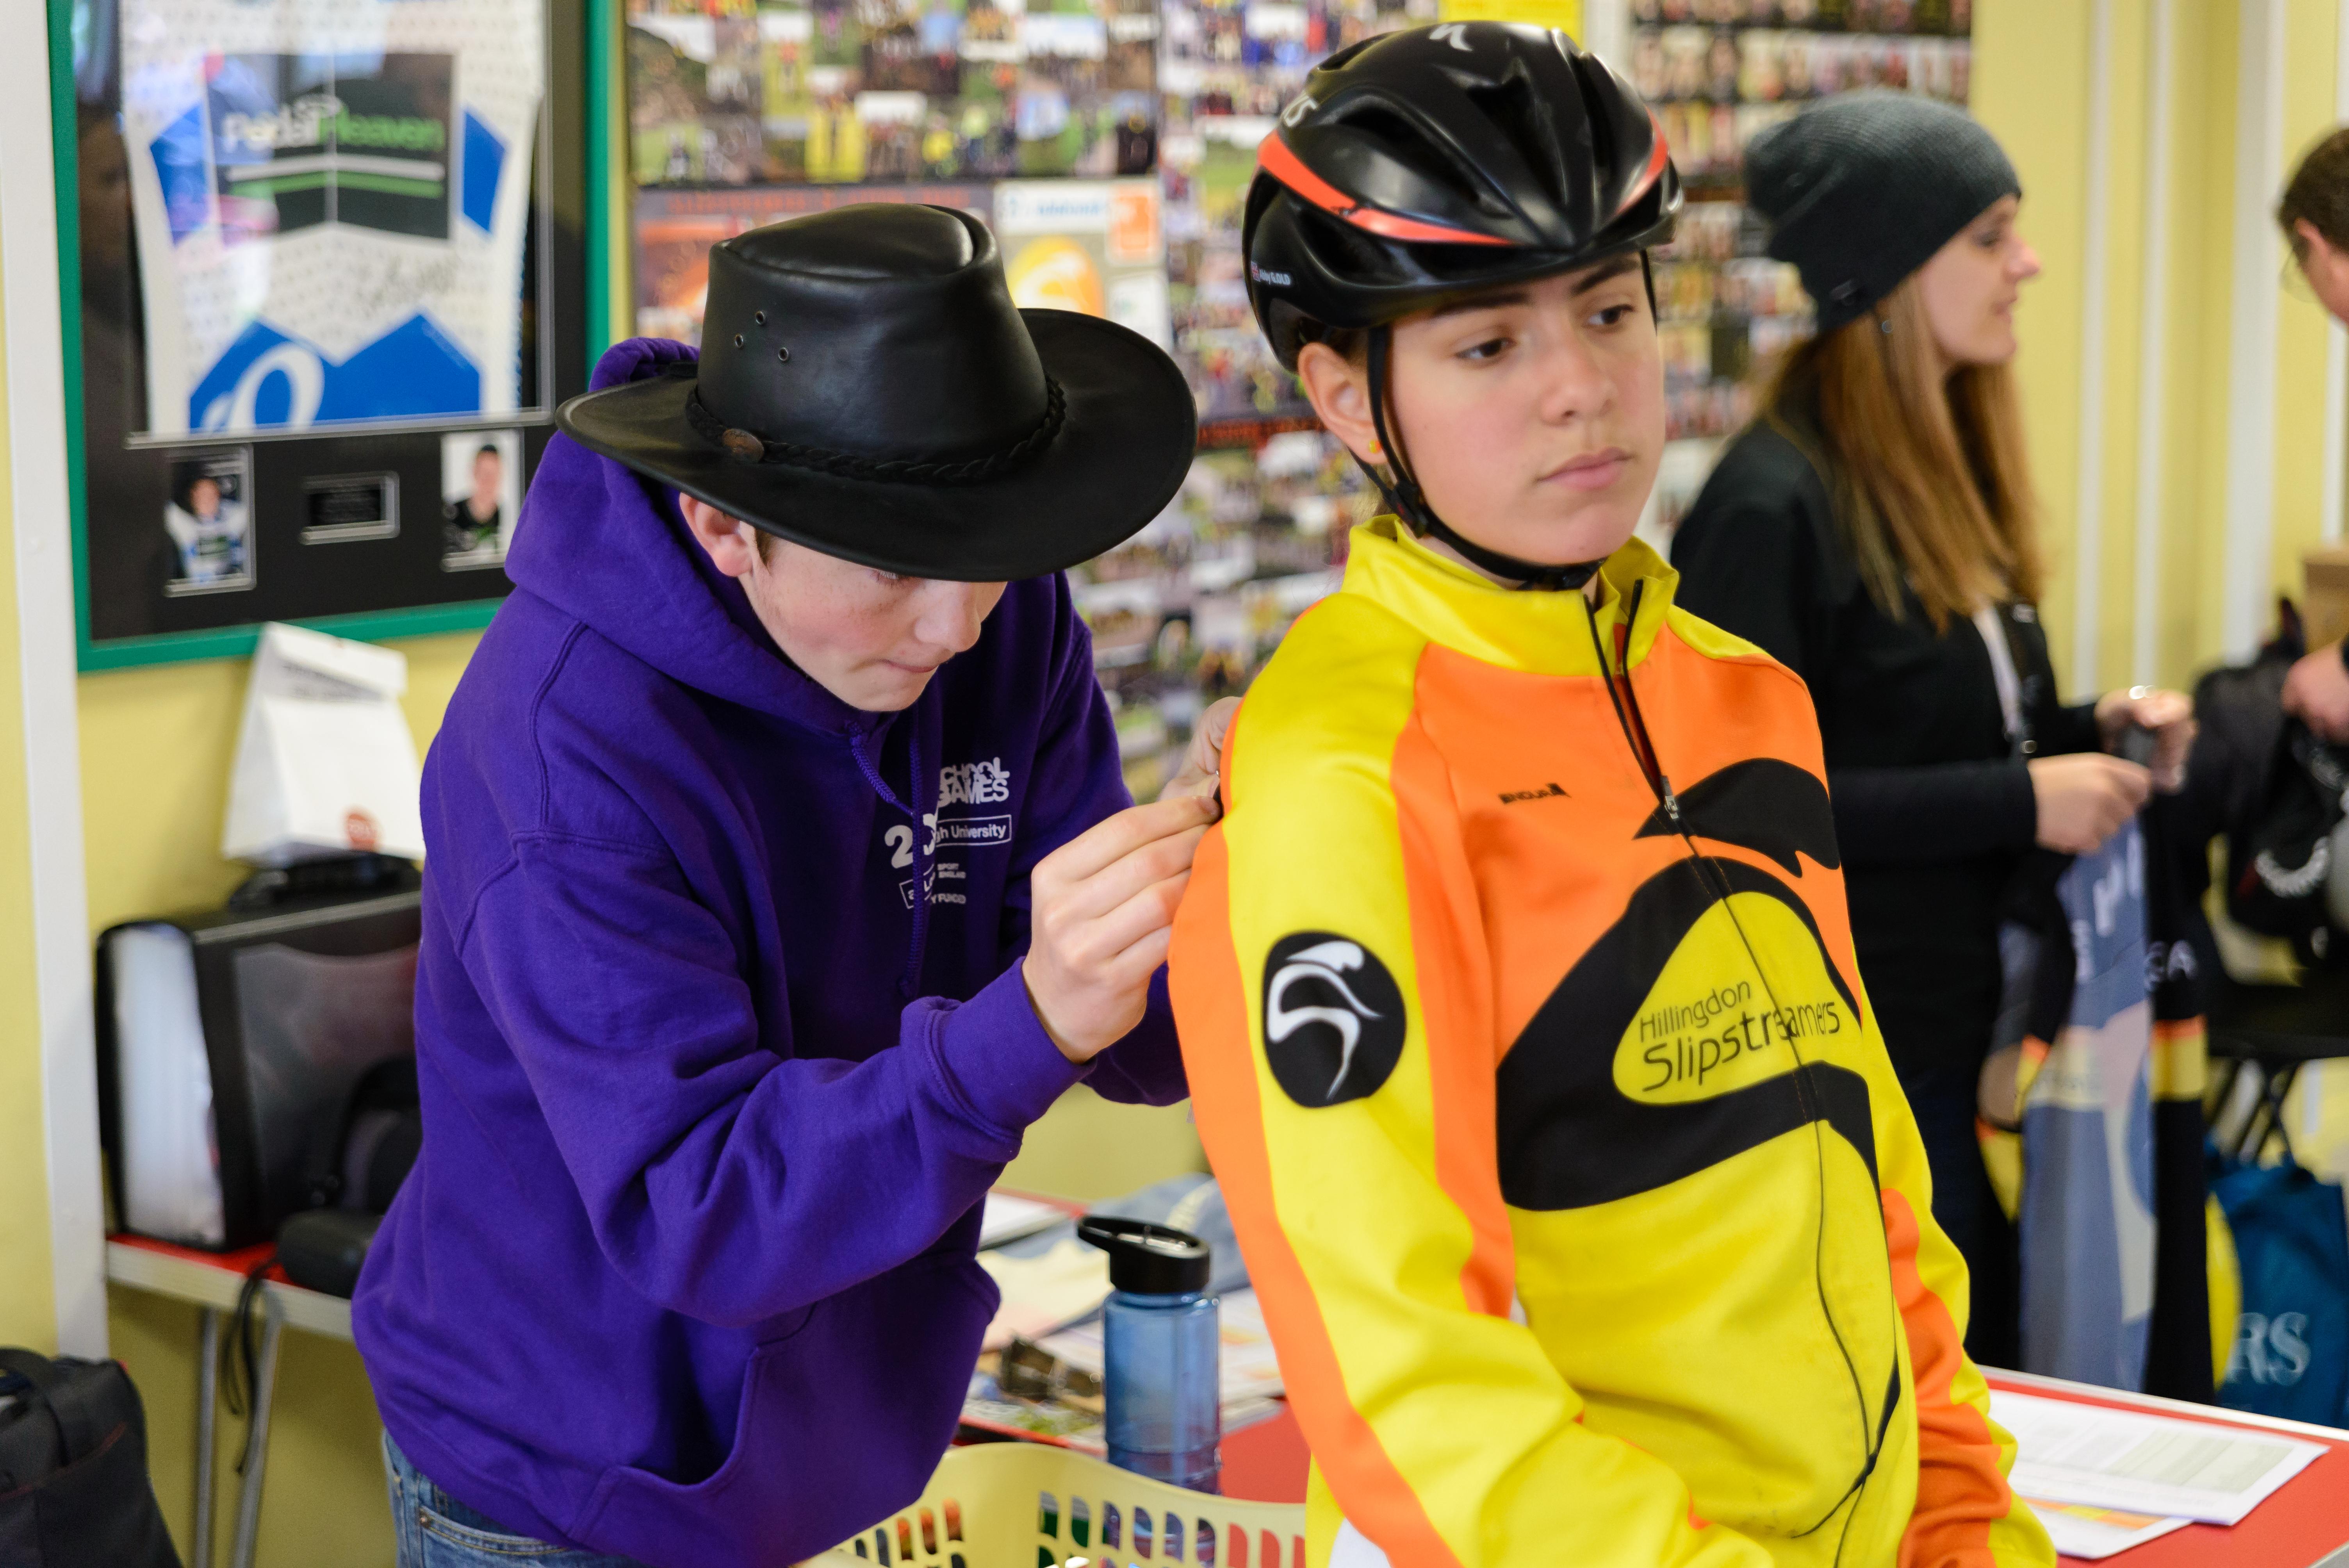 Volunteer pins a number onto a cyclist shirt